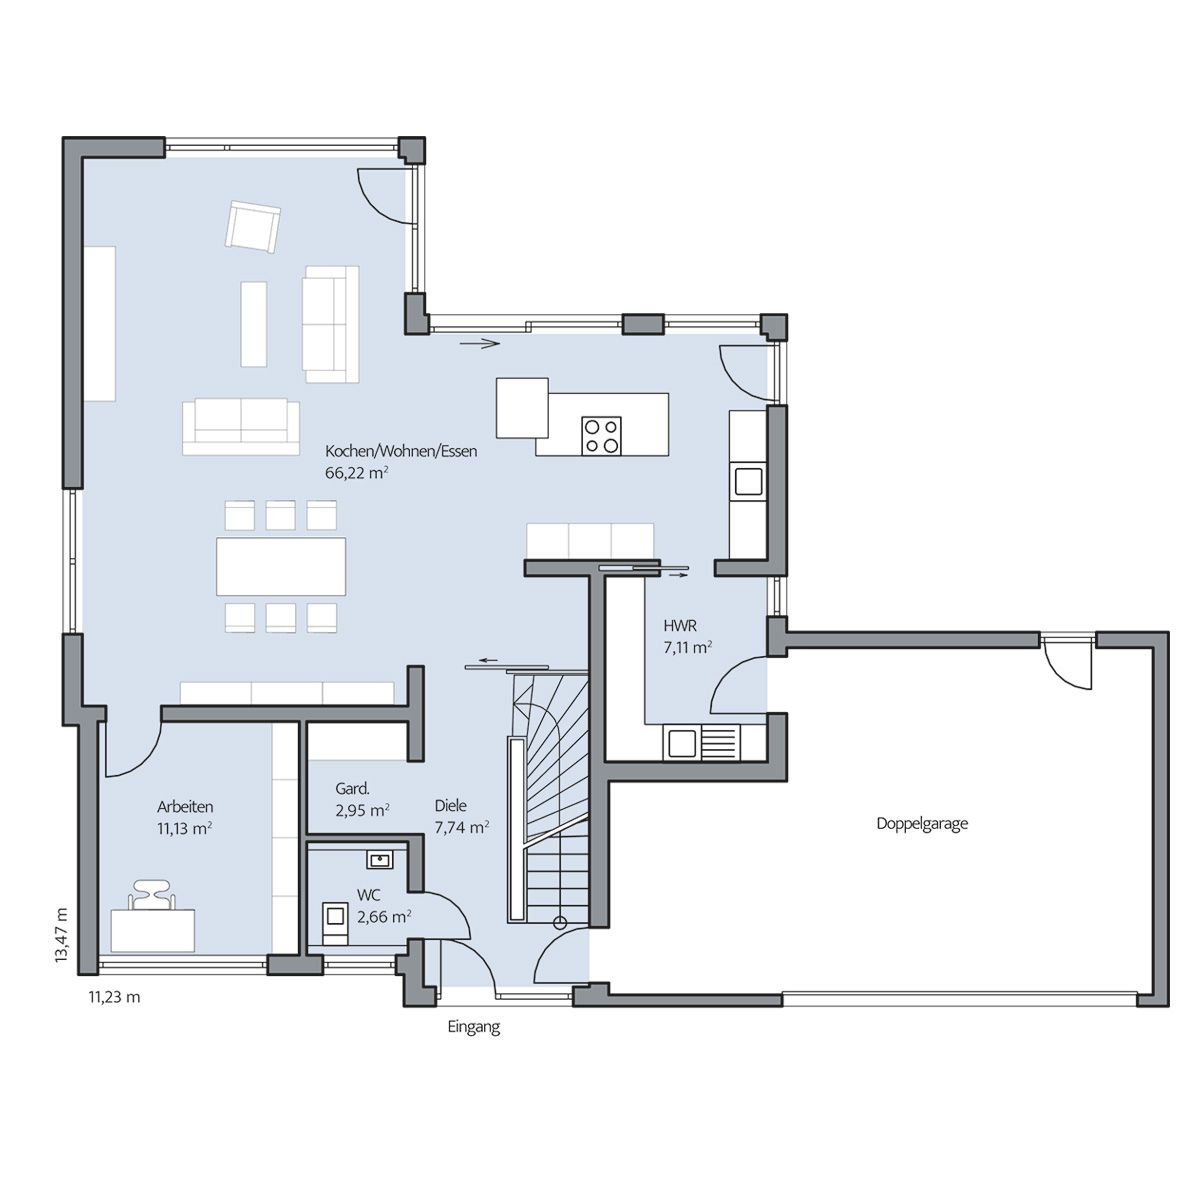 Haus mit doppelgarage grundriss  Haus-Schoenborn_Grundriss_EG_bemasst_col16-hg.jpg (1200×1200 ...